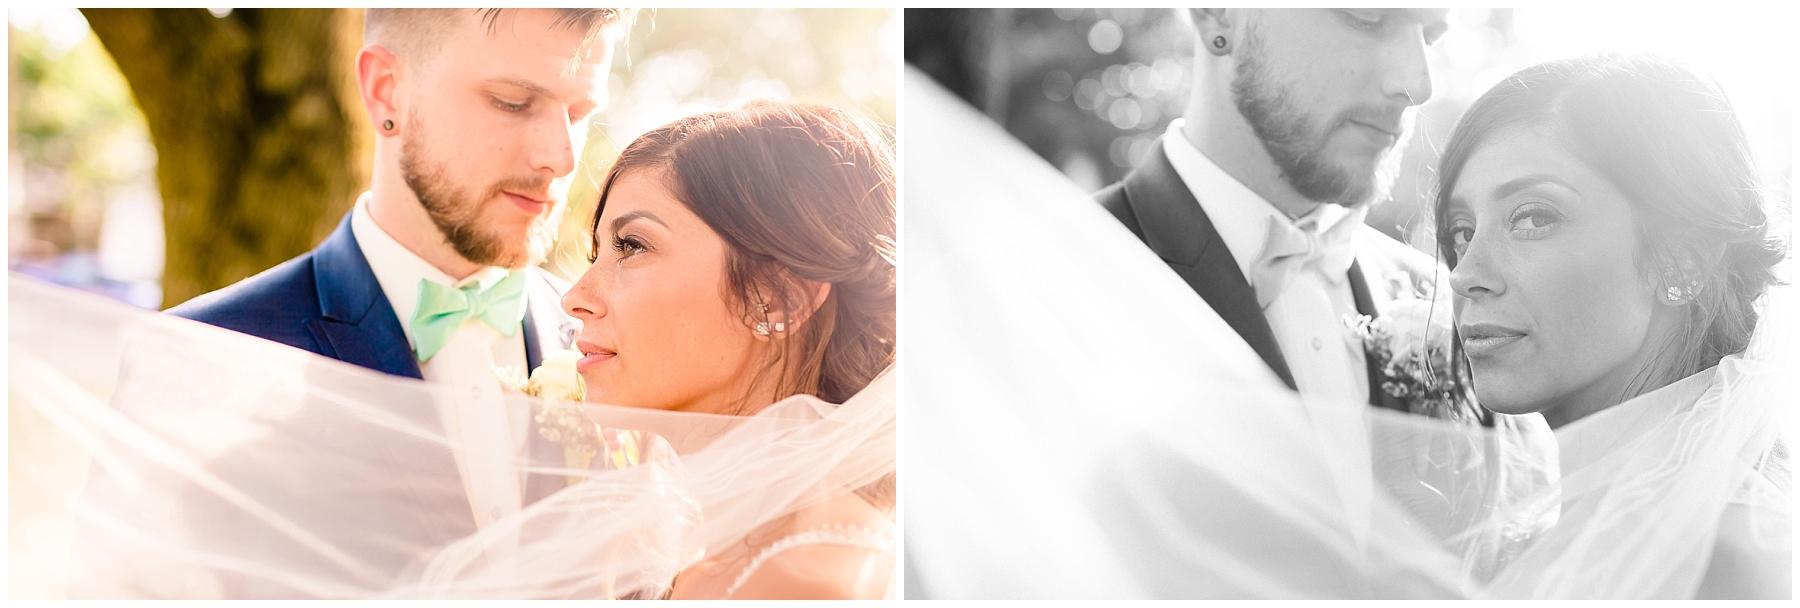 lafayette indiana wedding photography destination wedding fowler house mansion_0099.jpg